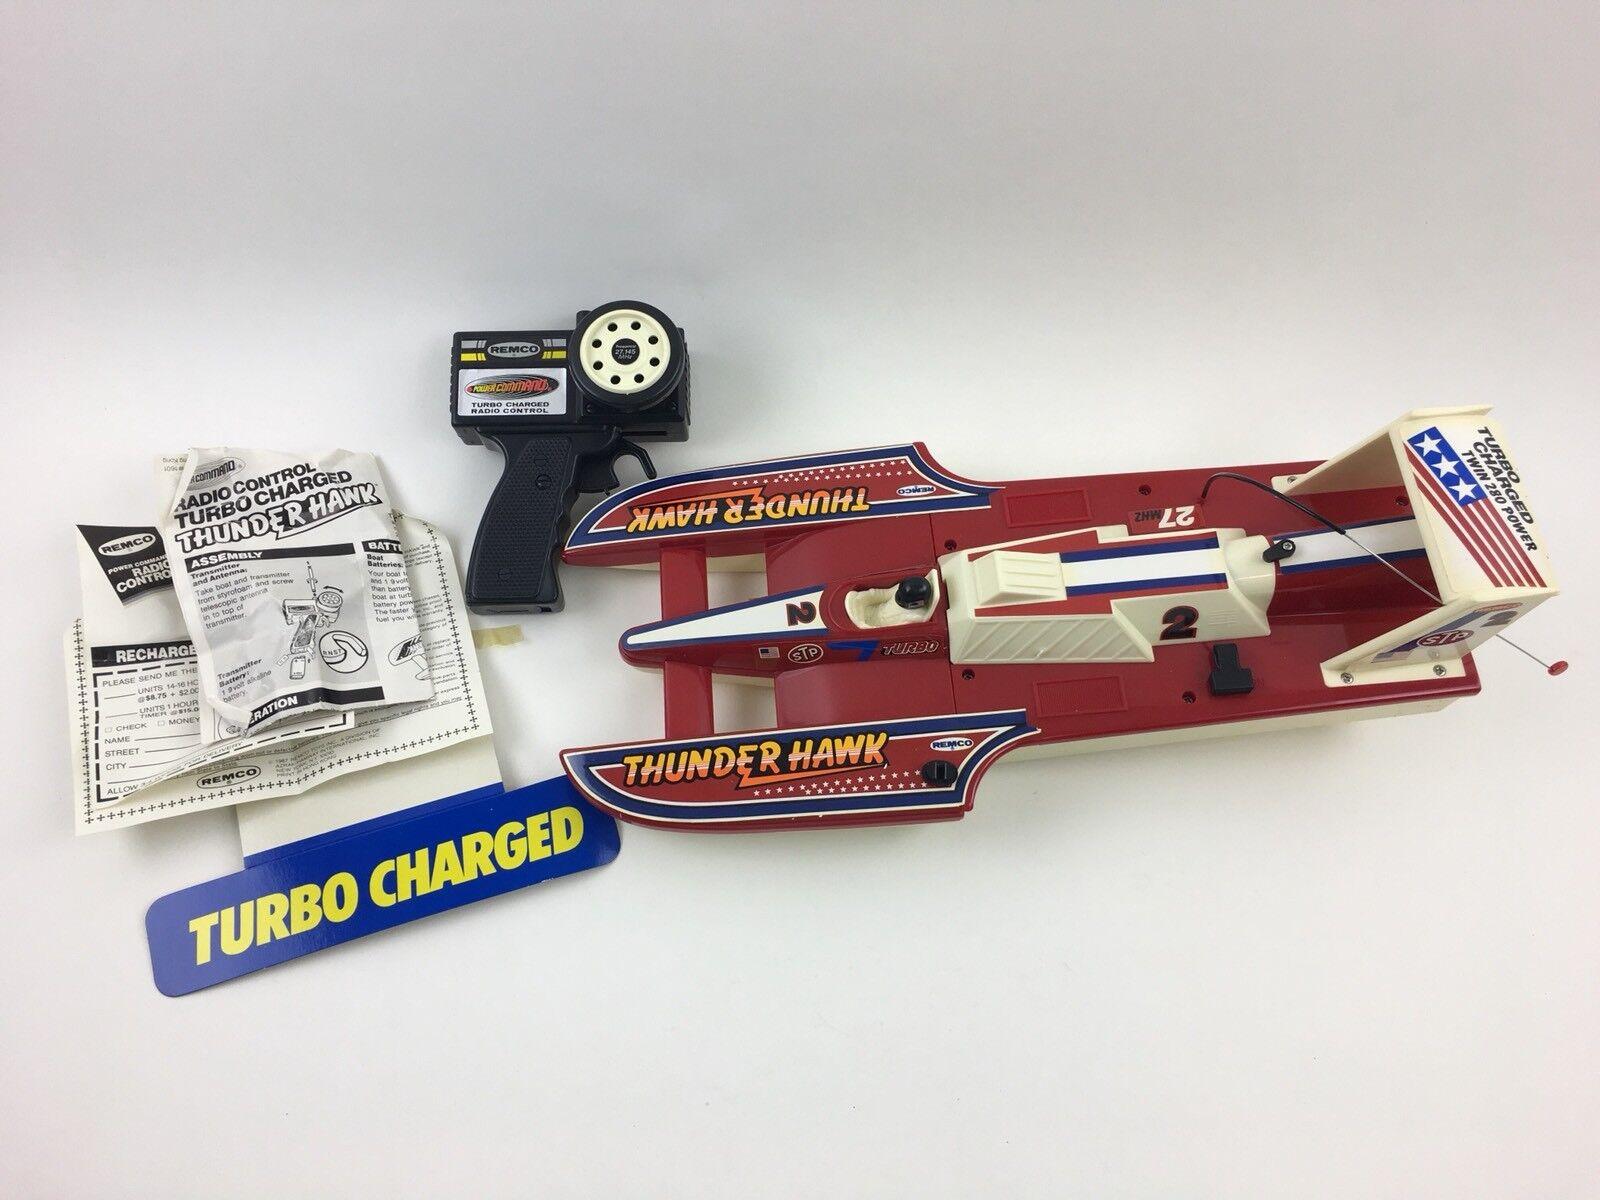 Vintage Remco Thunder Hawk Remote Control Watercraft Vehicle R/C boat new unused